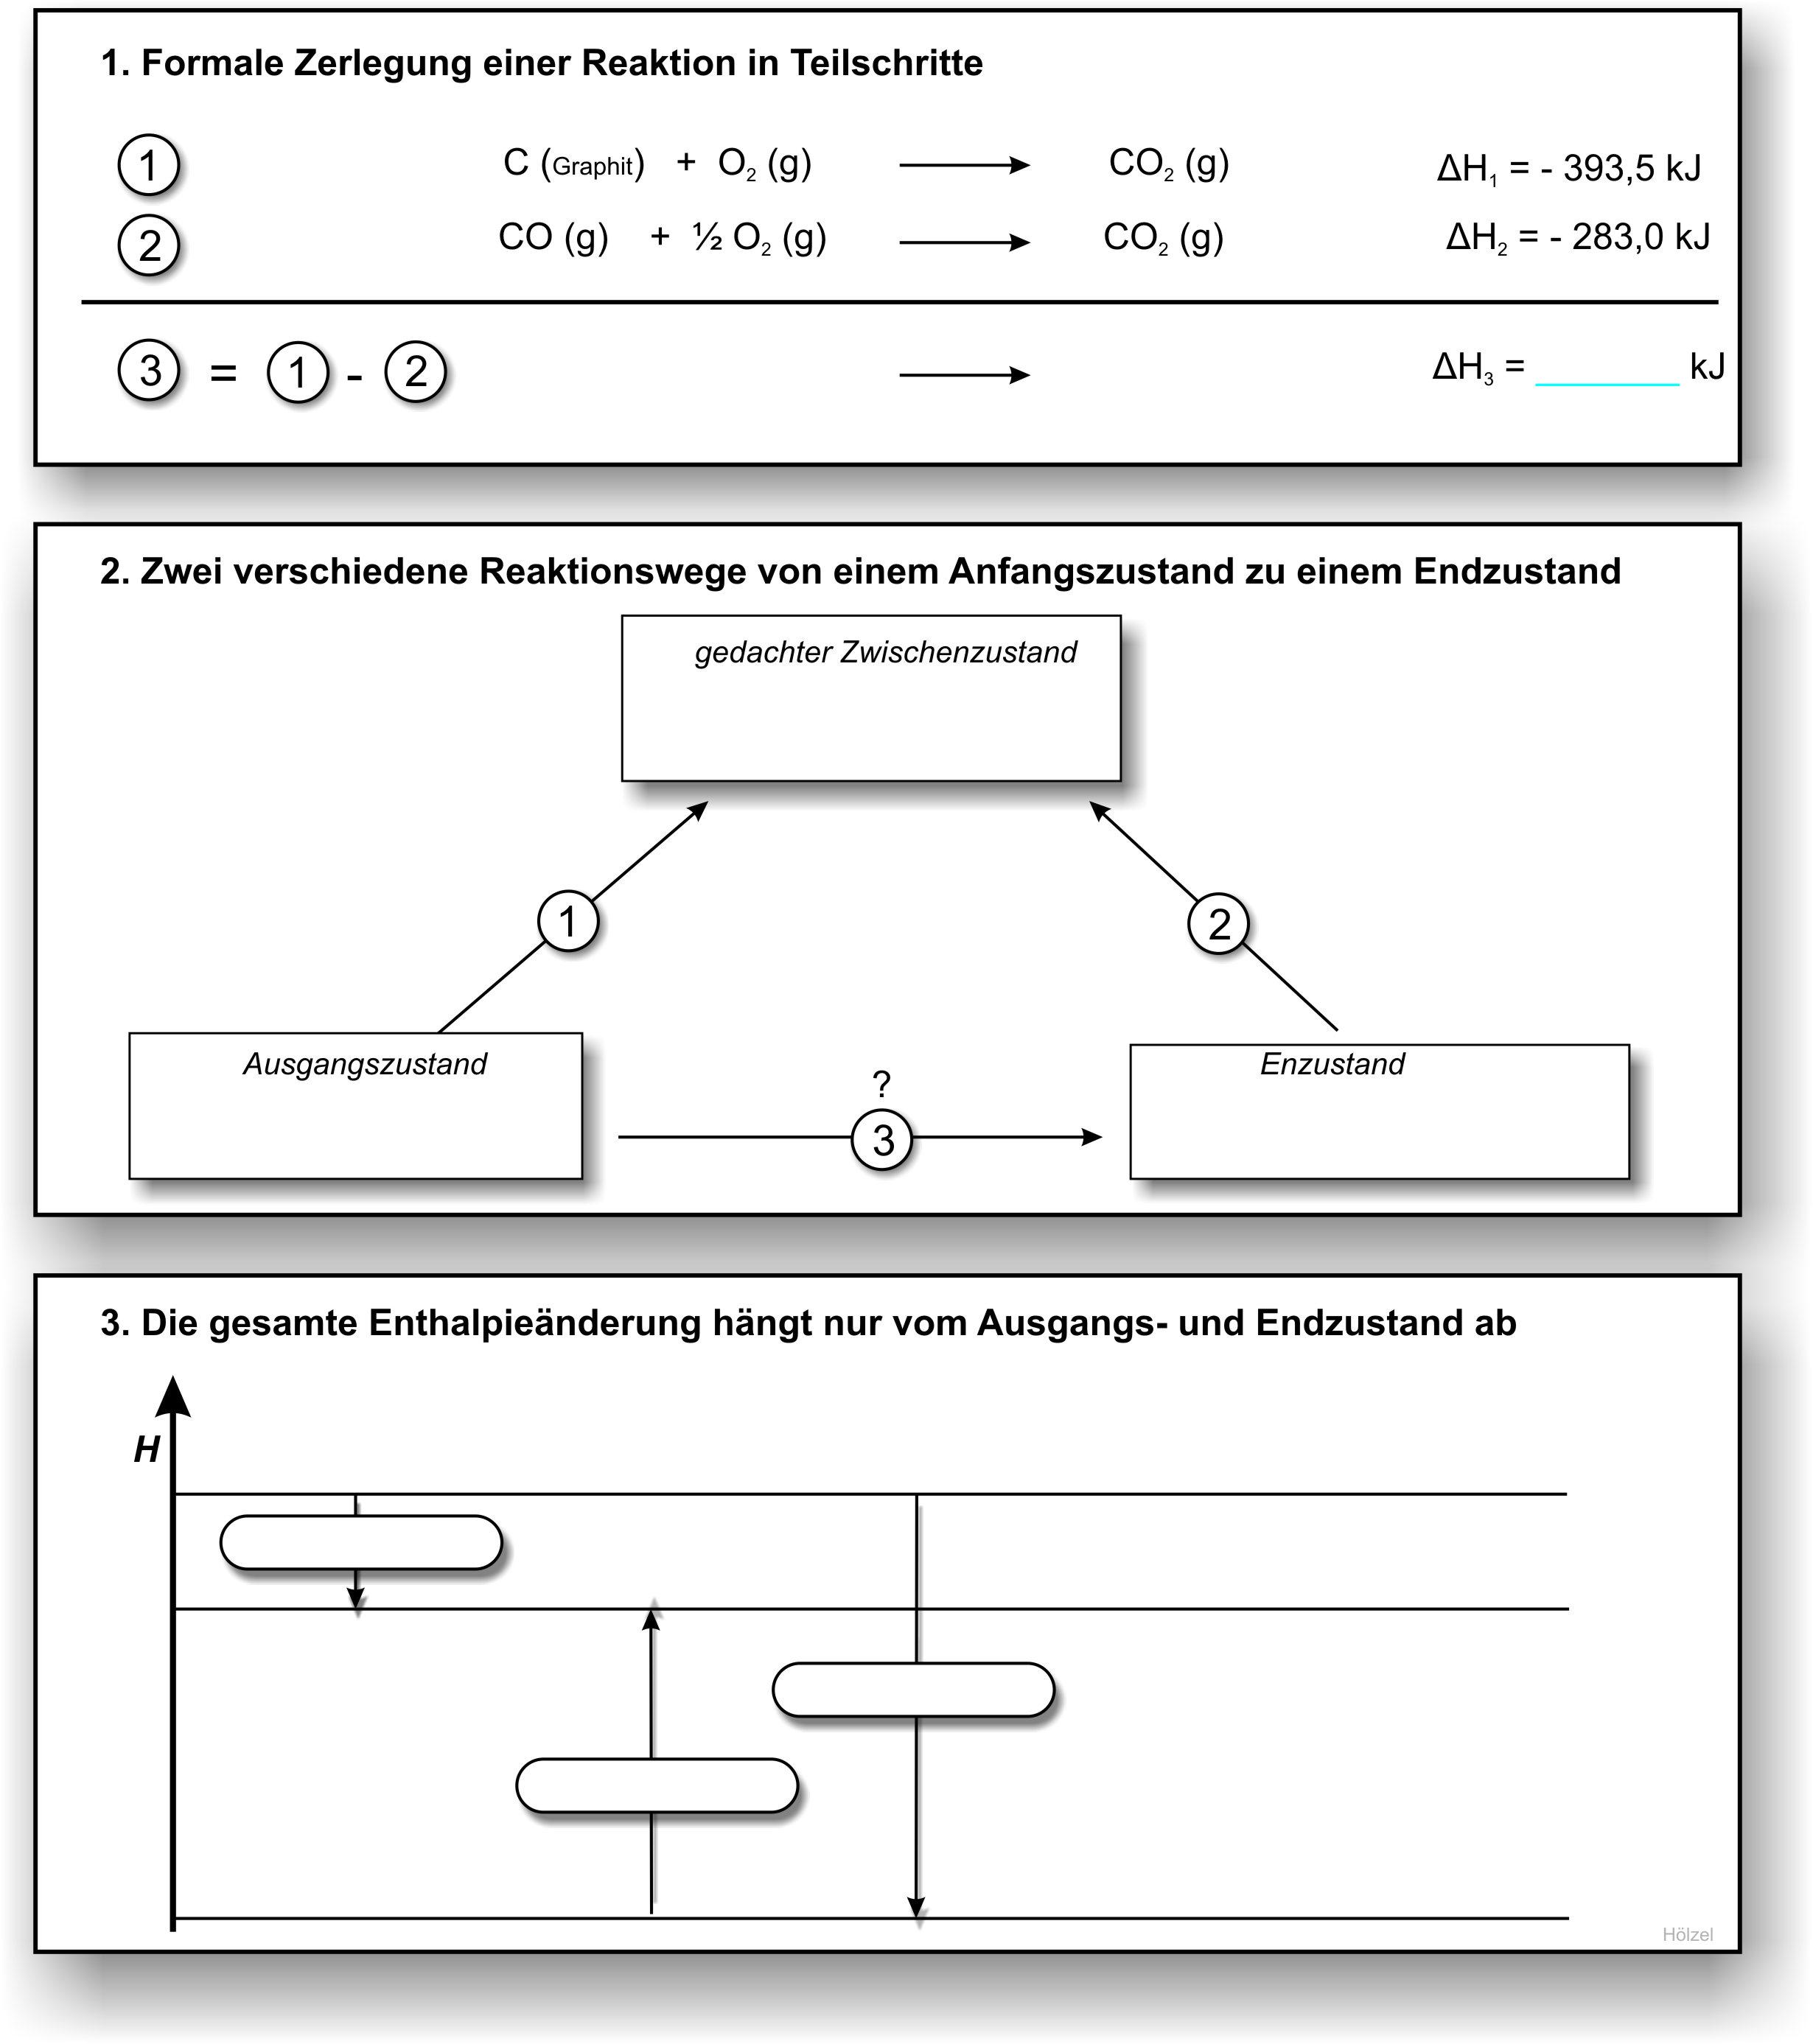 Groß Enthalpie Arbeitsblatt Chemie Fotos - Mathe Arbeitsblatt ...